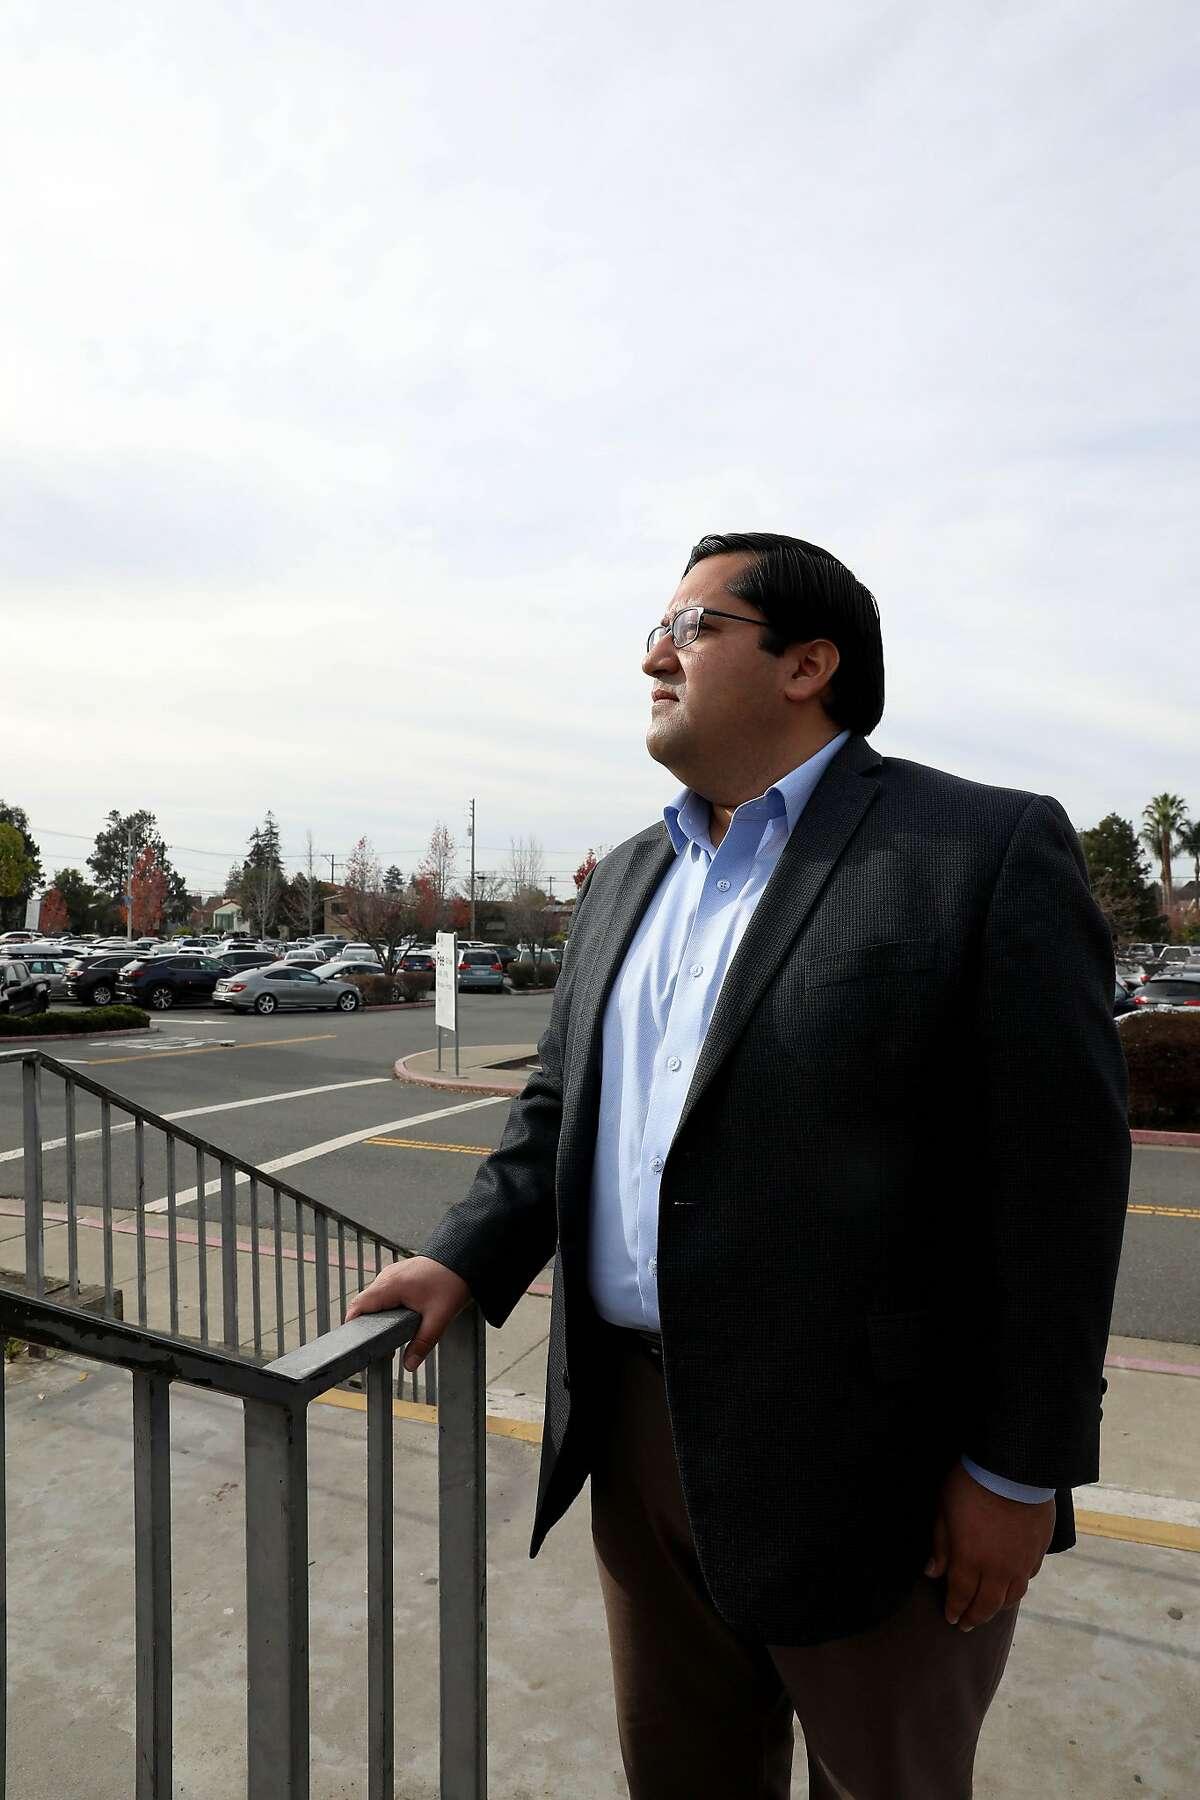 Mayor Jesse Arreguin poses for a portrait at the North Berkeley BART Station in North Berkeley, Calif., on Tuesday, December 17, 2019.